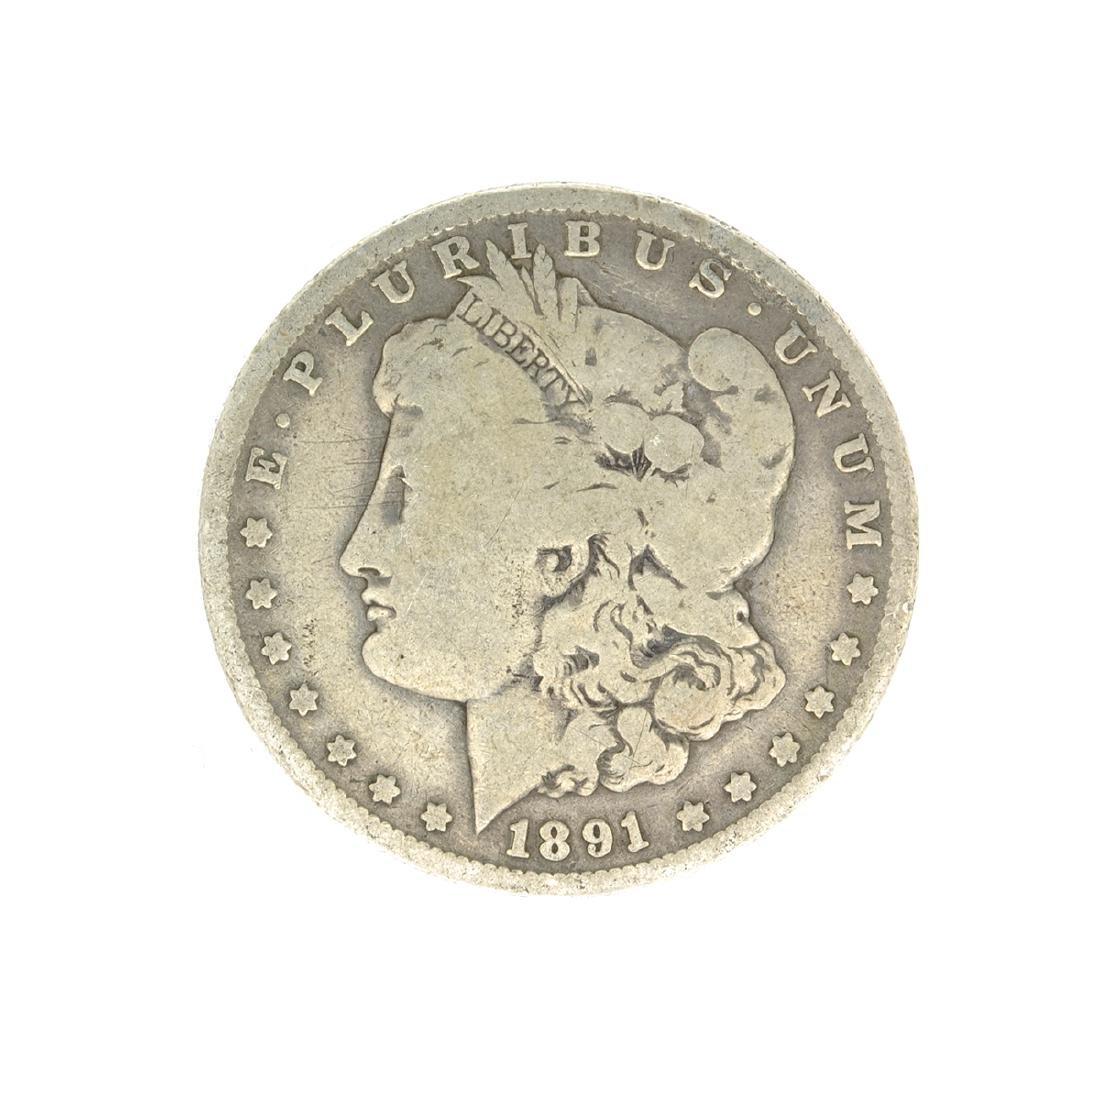 Rare 1891-O U.S. Morgan Silver Dollar